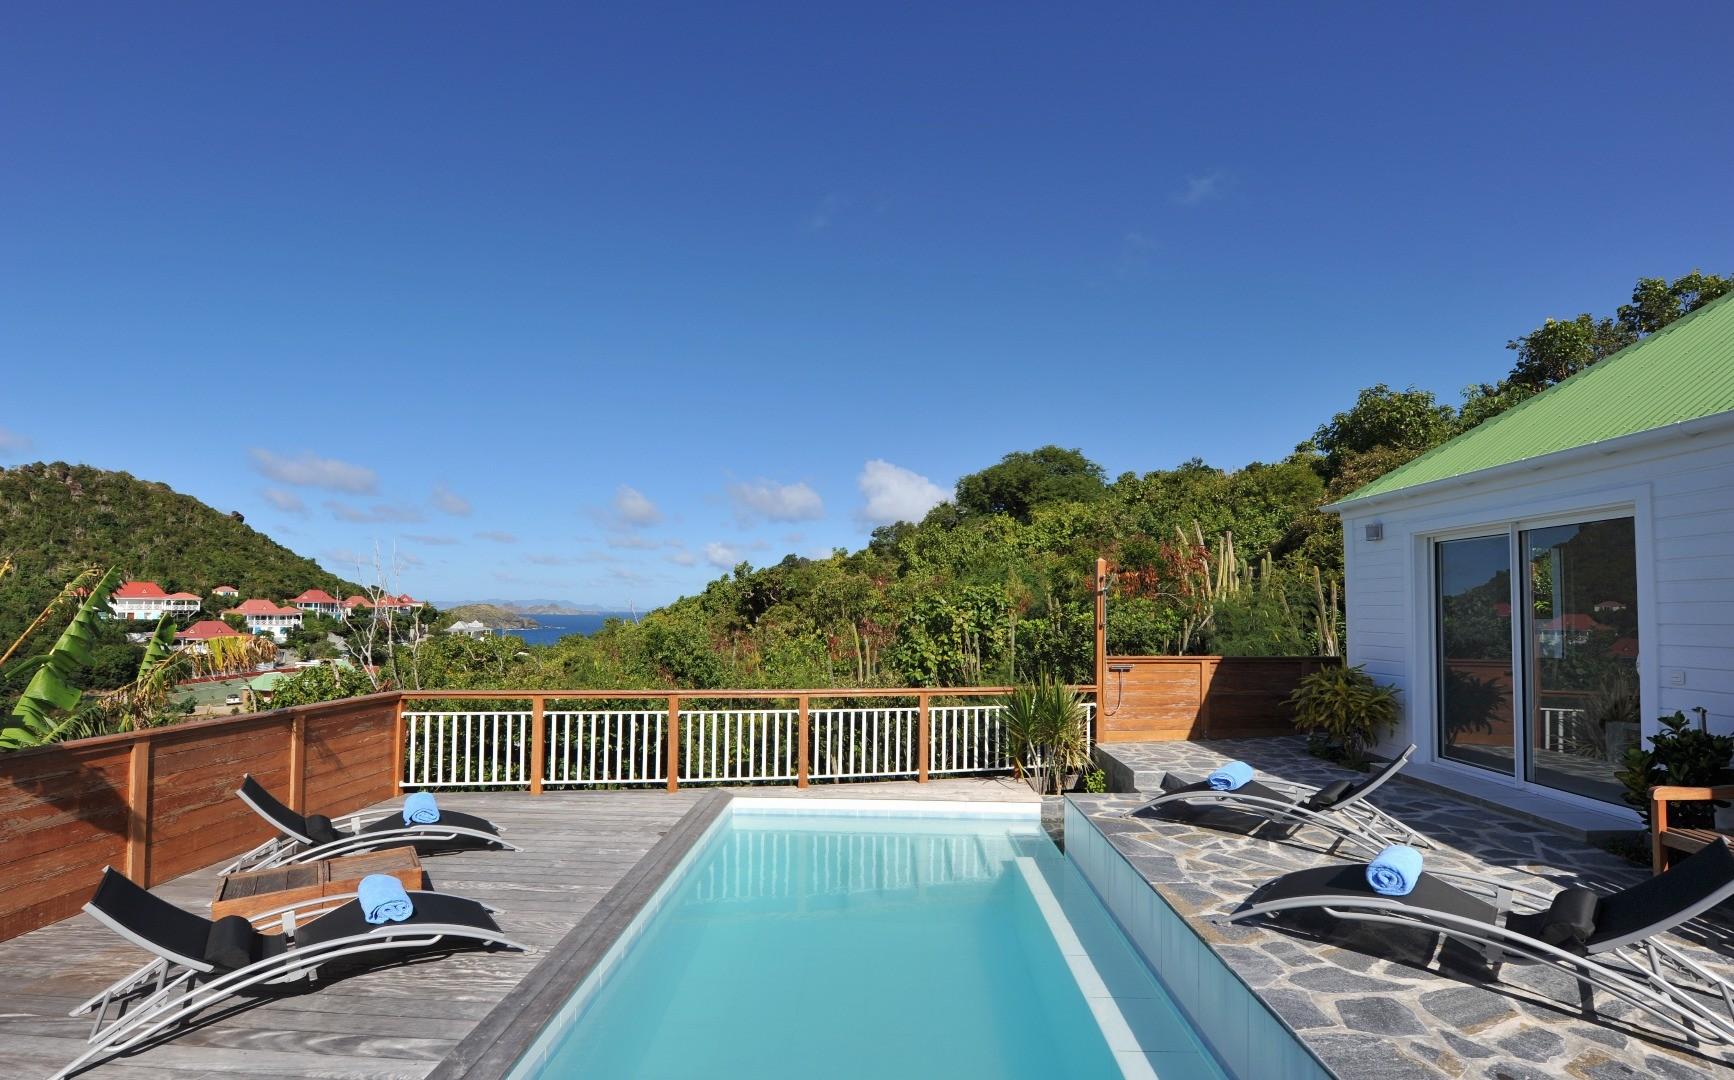 Best Island Beaches For Partying Mykonos St Barts: Apsara - Villa Apsara St Barts